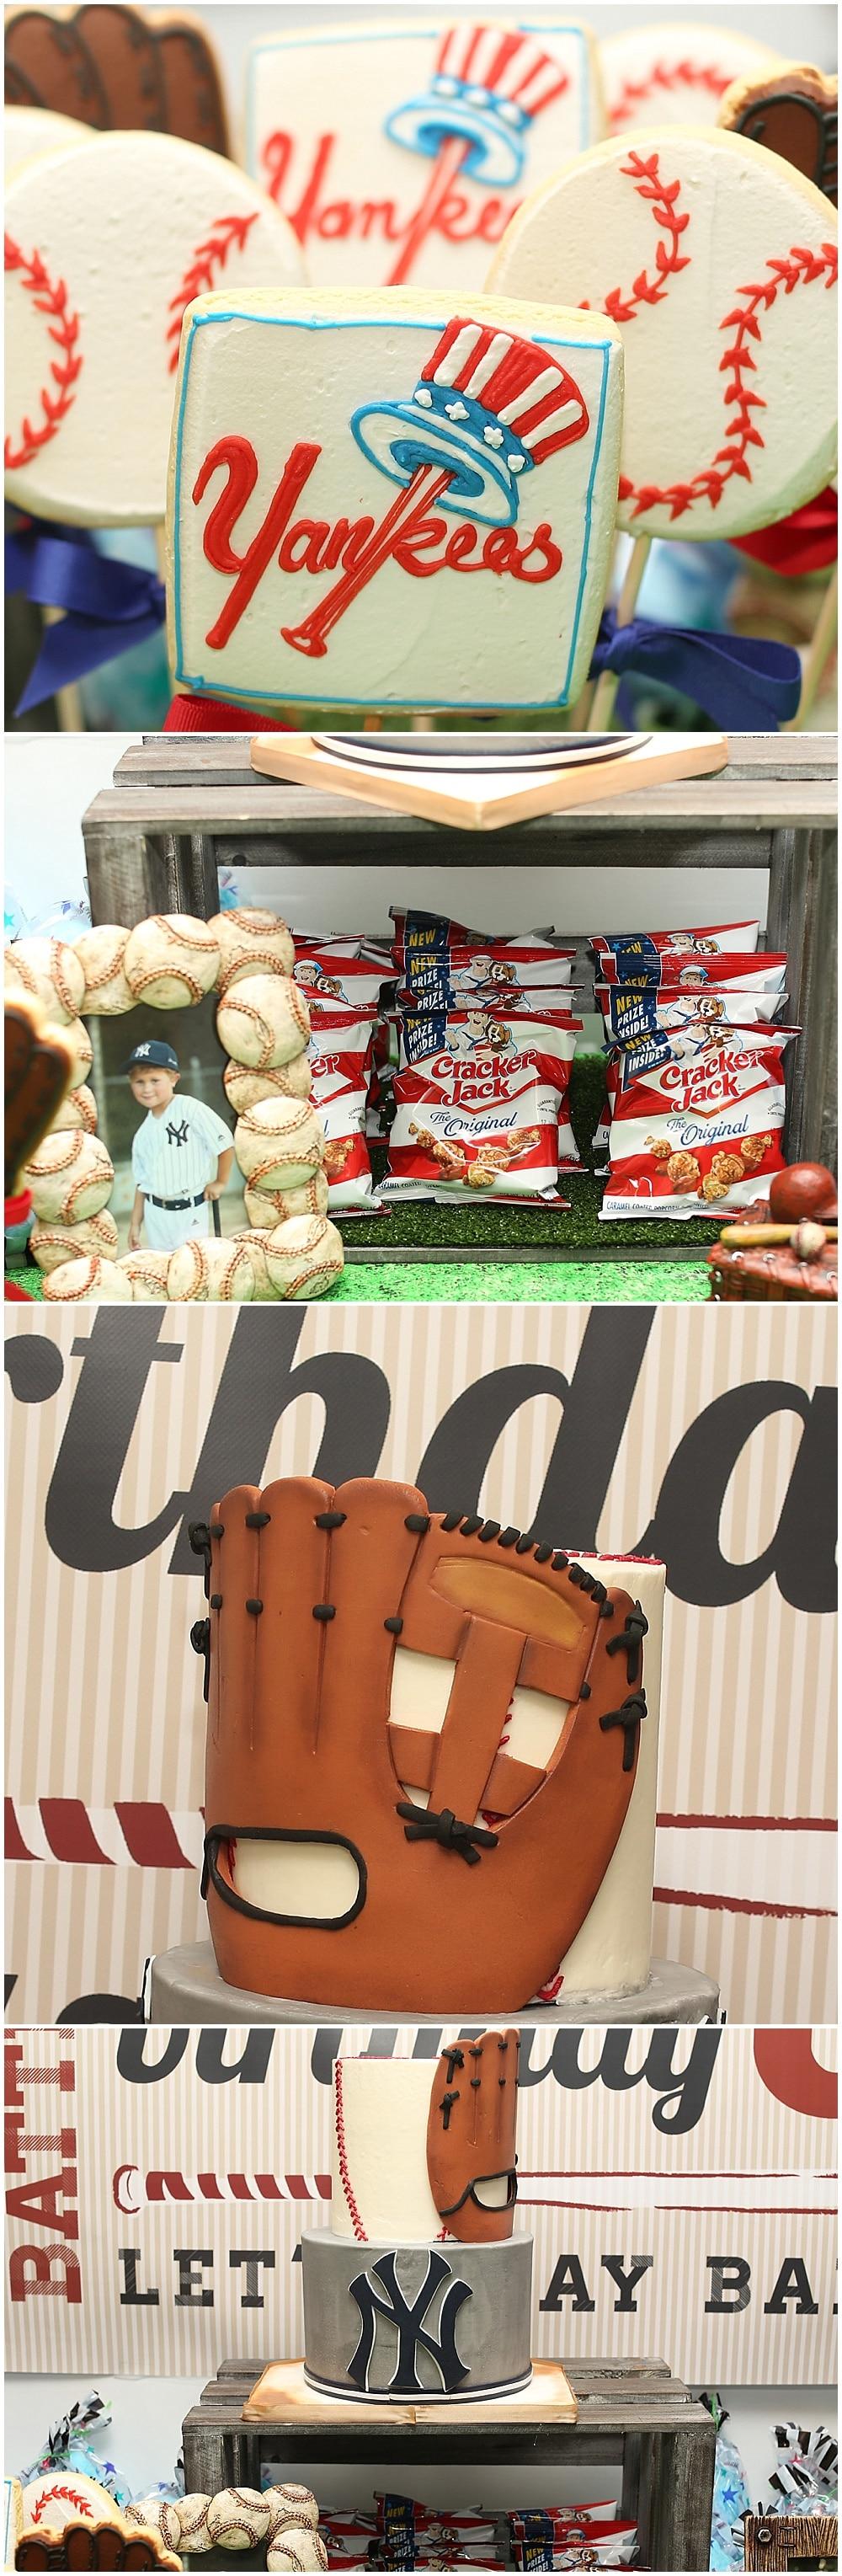 Baseball Party Ideas + Tips